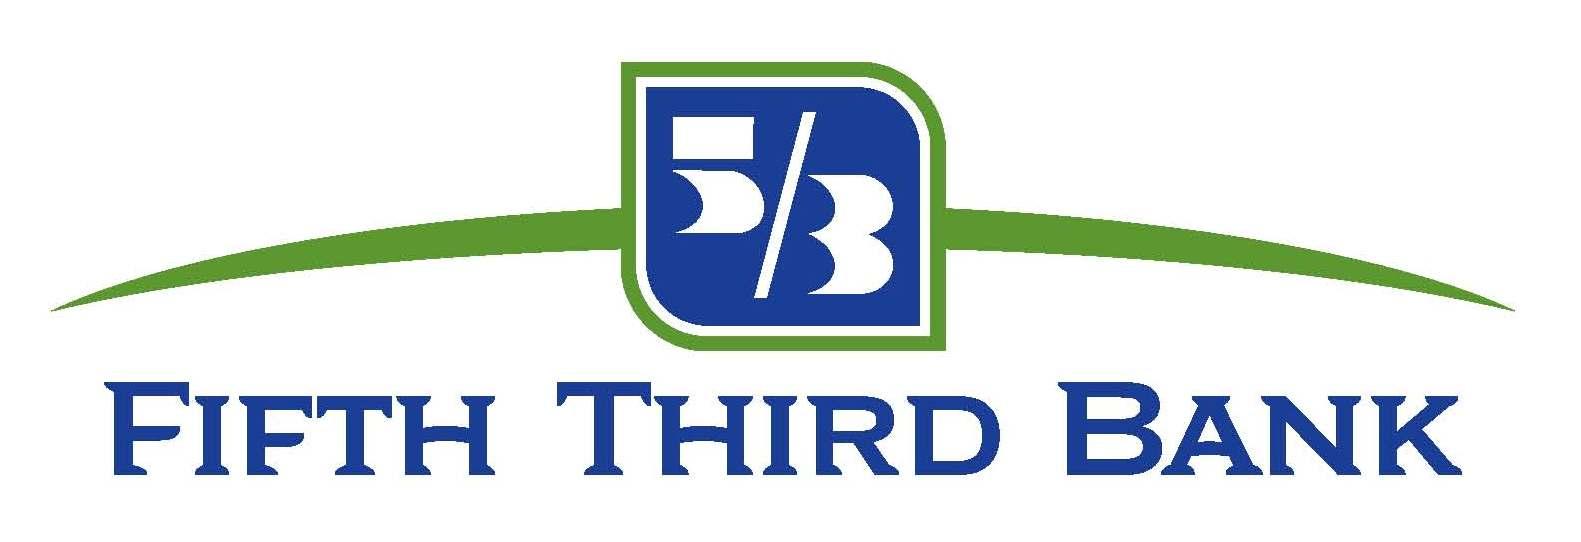 Fifth-third-bank